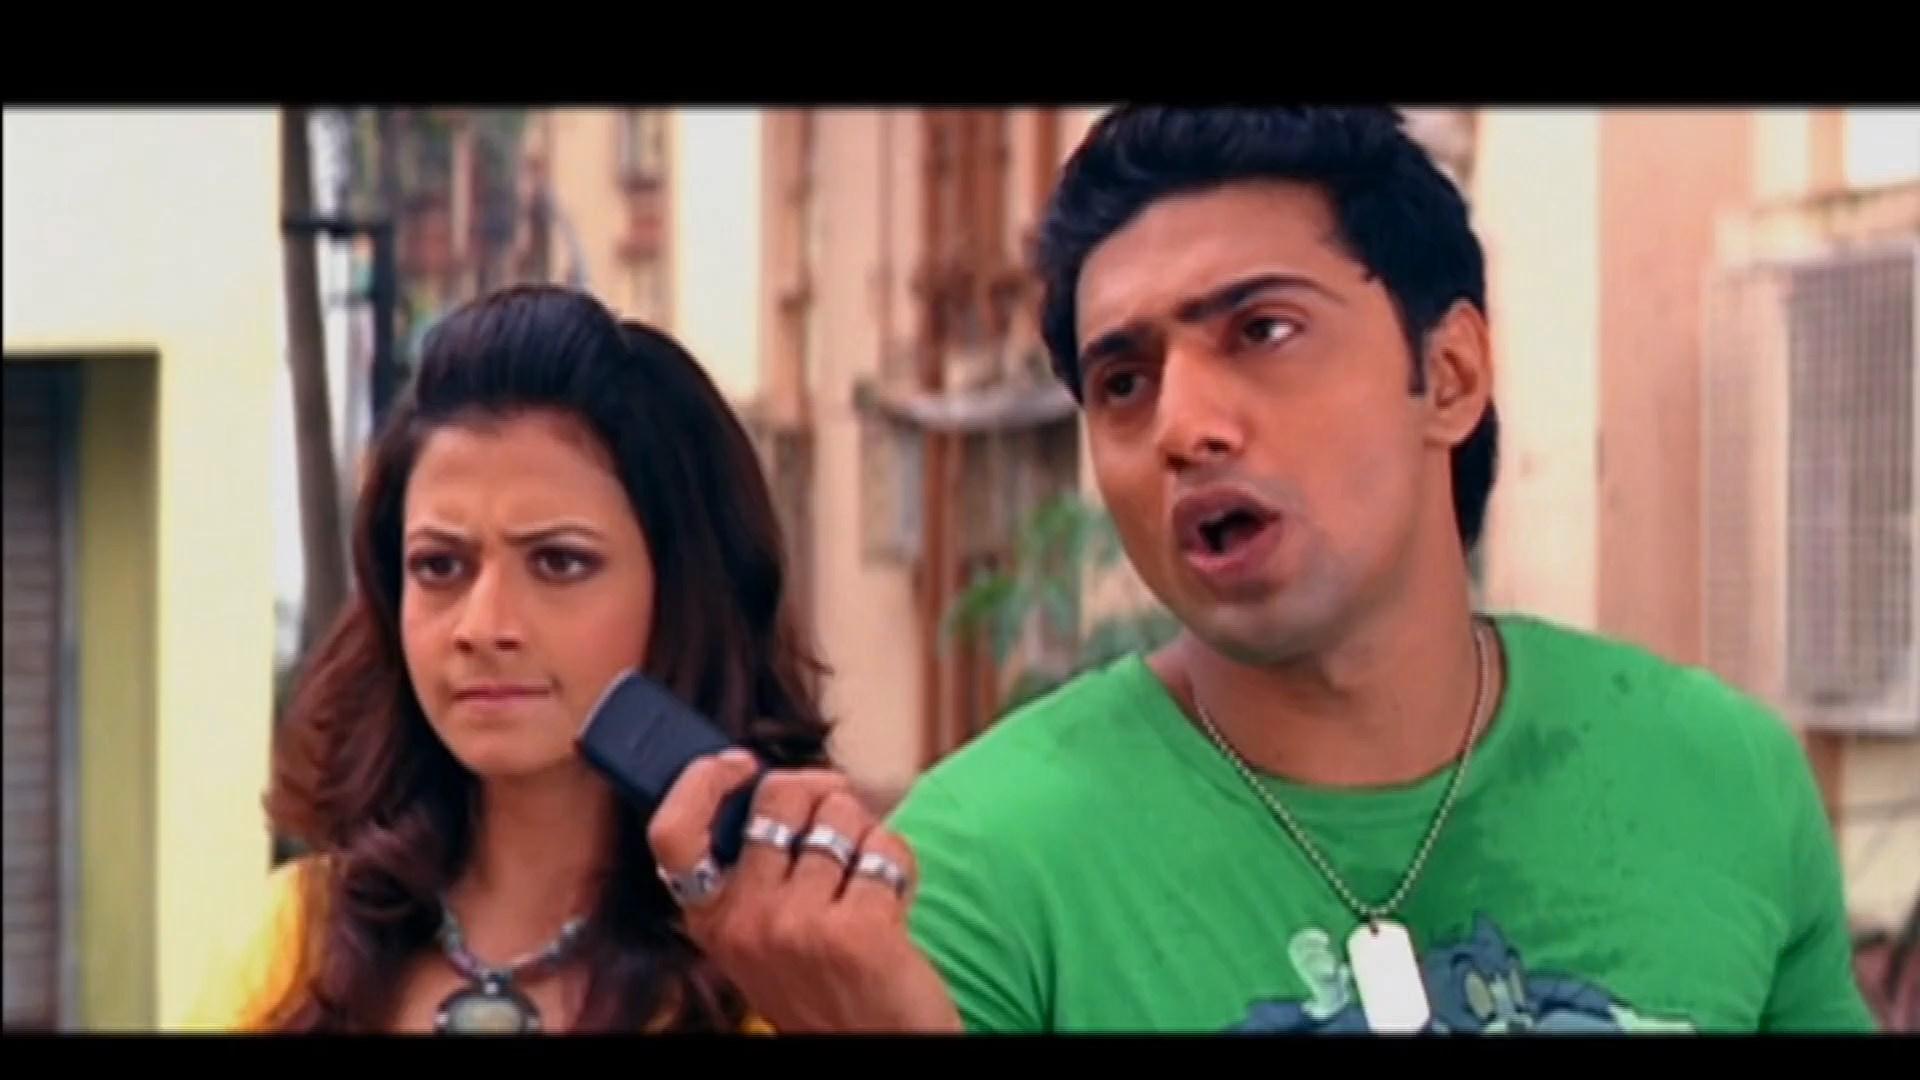 Bolo.Na.Tumi.Amar.2010.Bengali.1080p.Hotstar.WEB DL.AVC.AAC2.0.x264.ESub [ShiN0bi] .mkv snapshot 01.